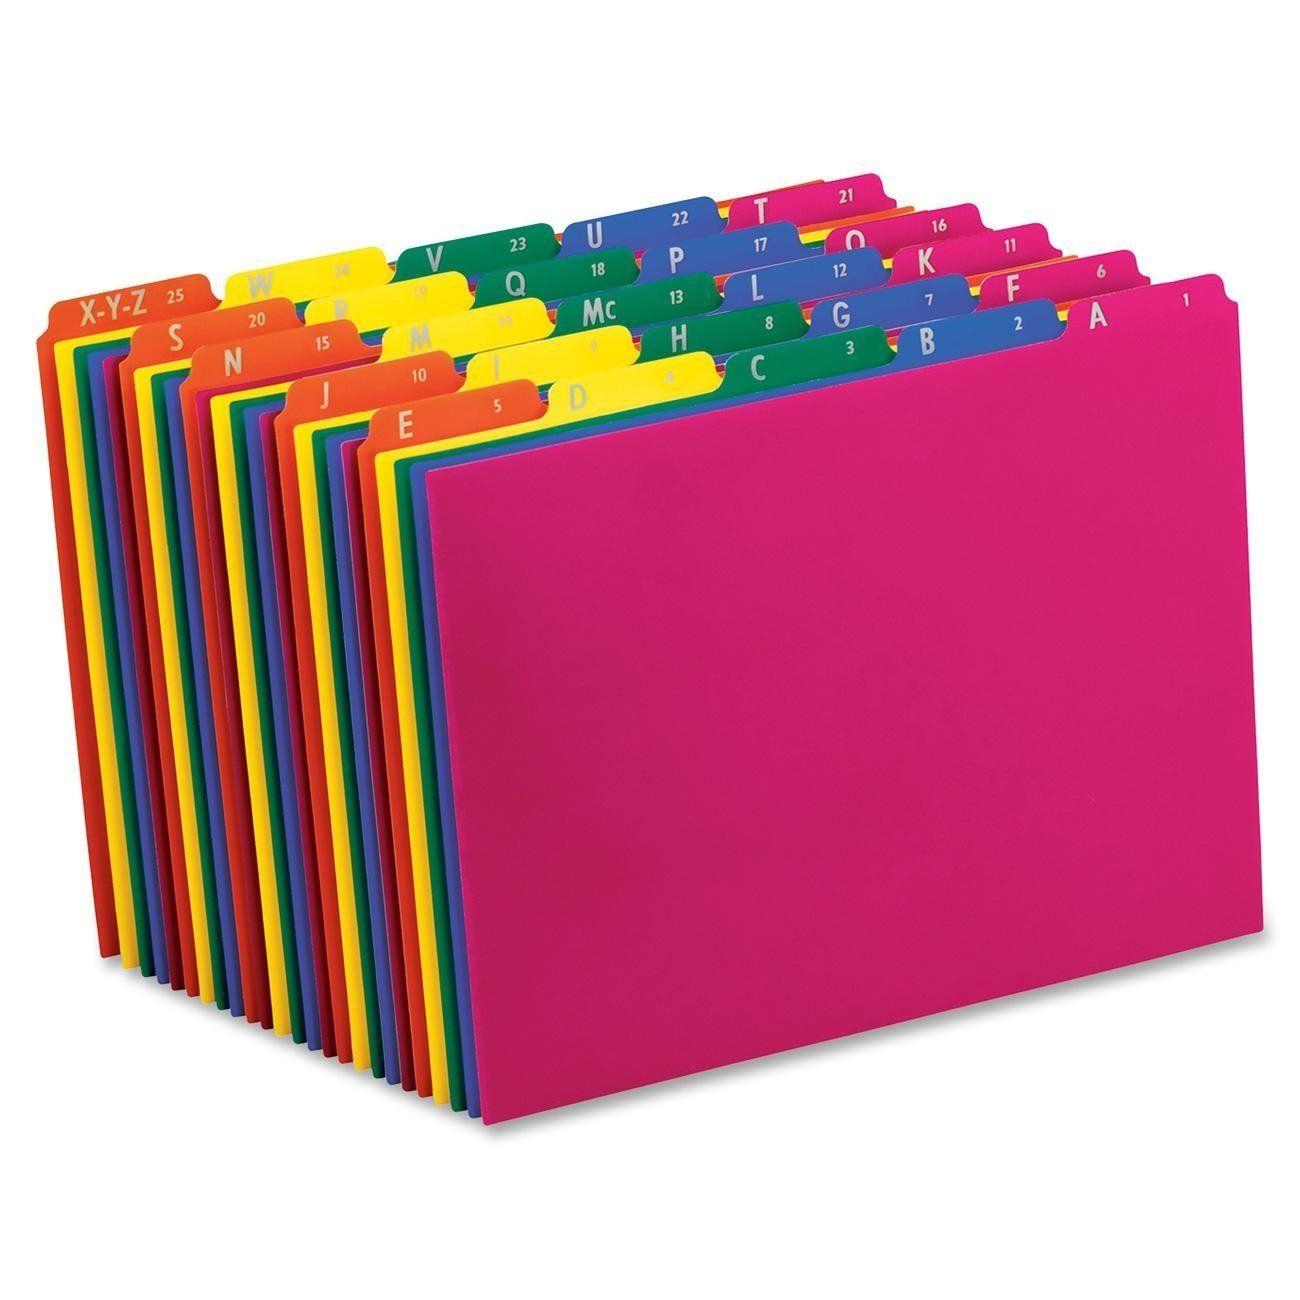 Amazon.com : Pendaflex Poly File Guides, A-Z, 1/5 Cut Top Tabs ...